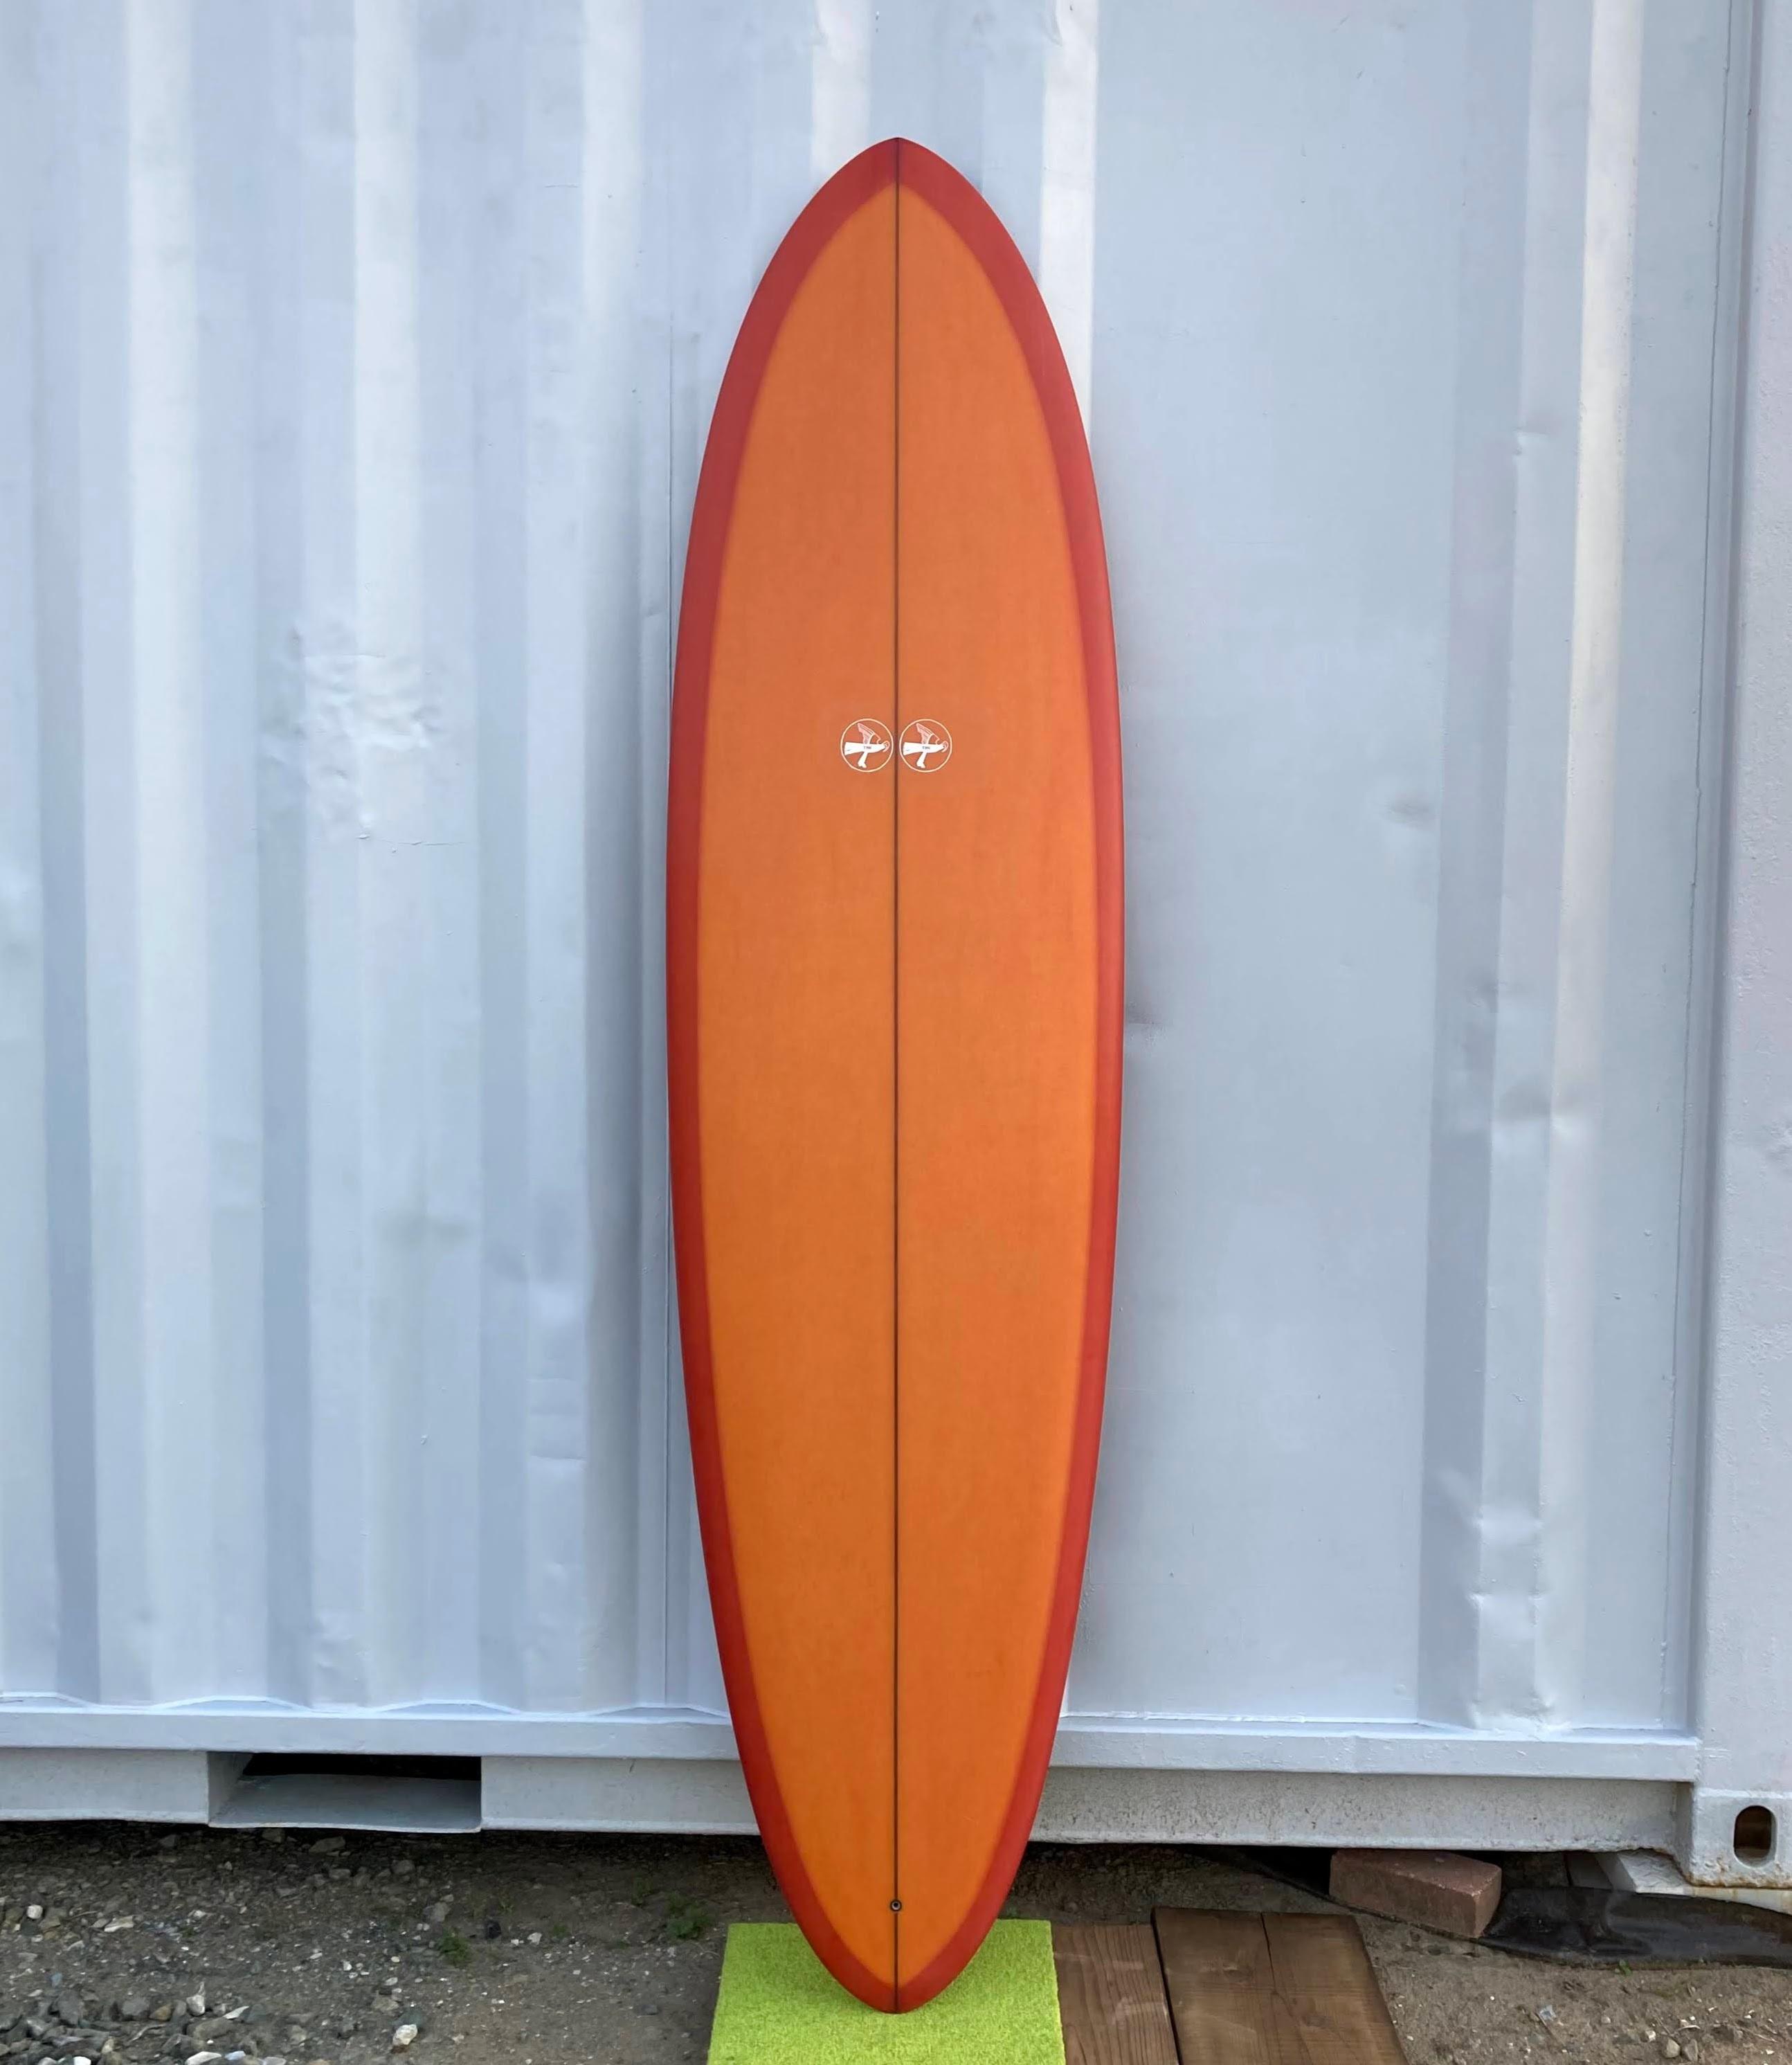 【THC SURFBOARDS】THC サーフボード Hanley  7'4-22 1/2-3 1/5